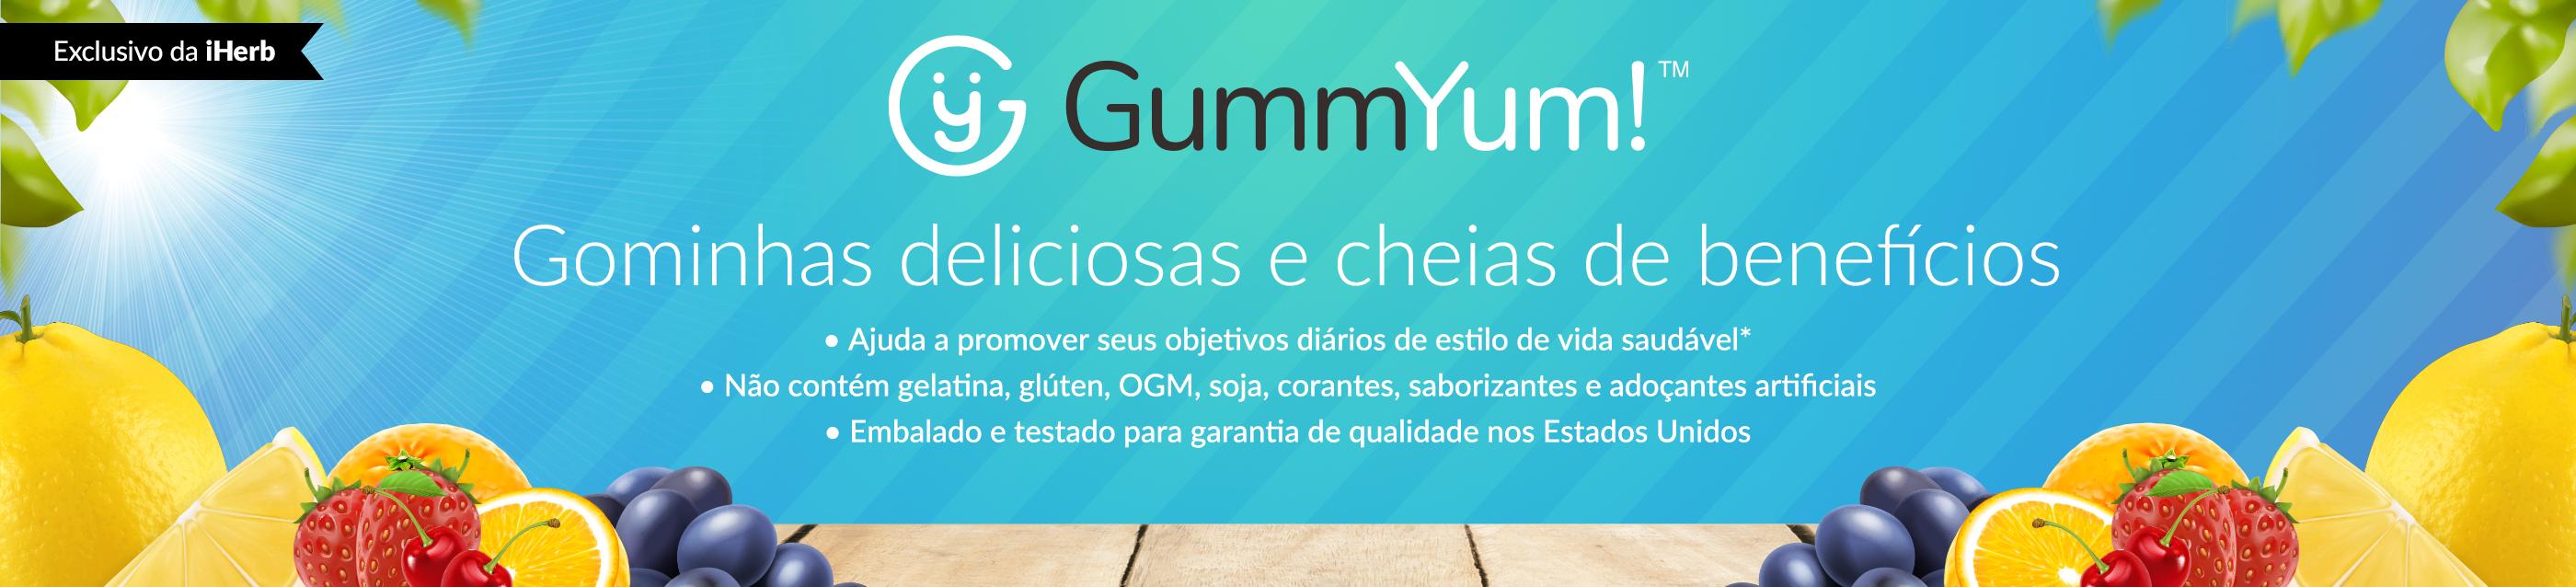 GummYum! main banner